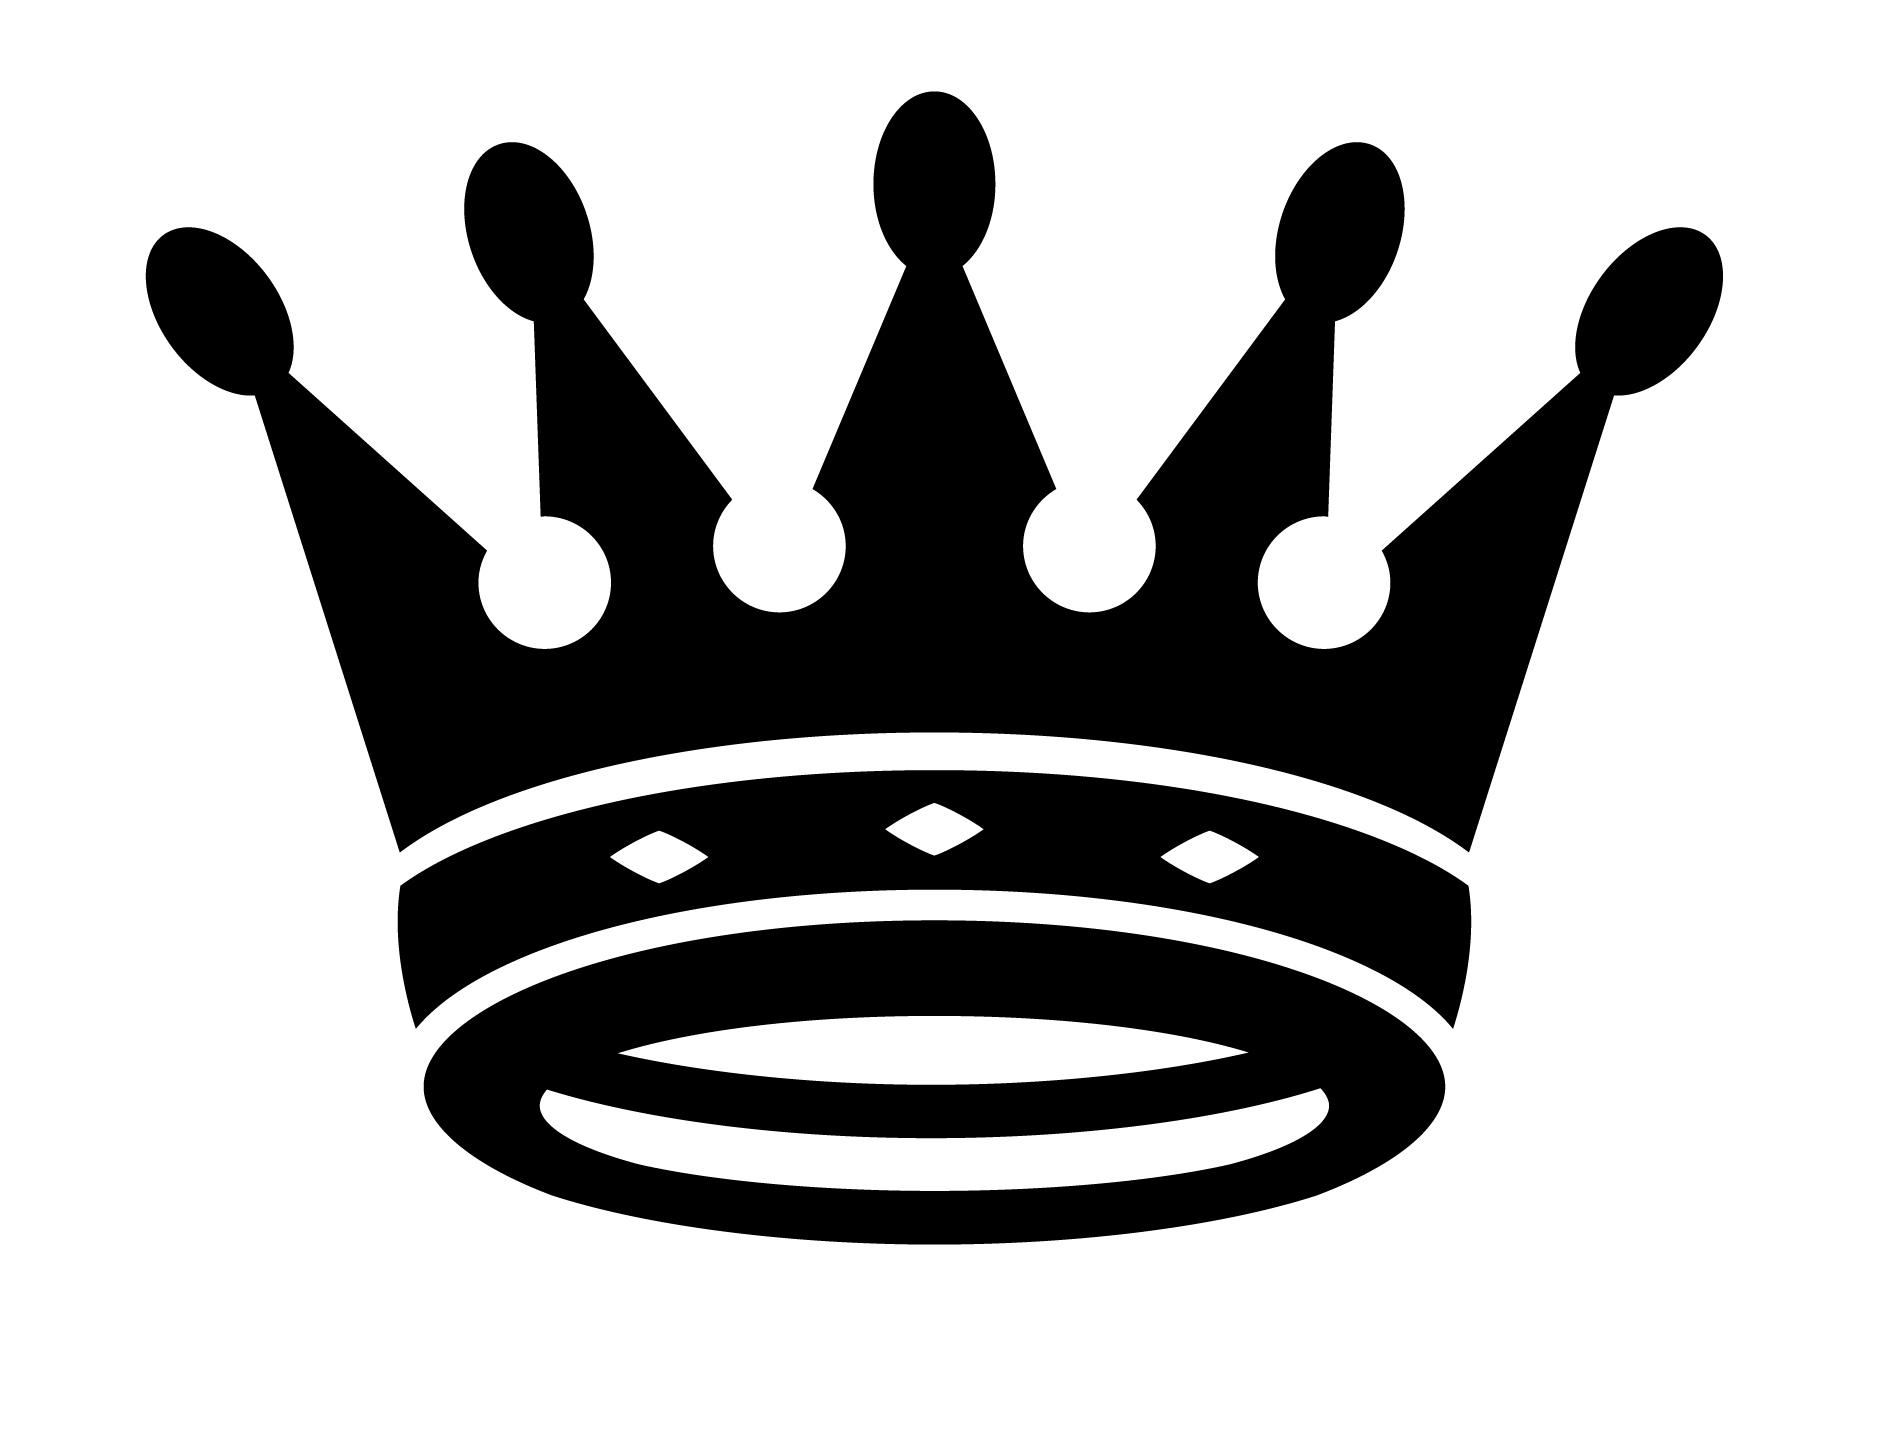 Crown - Brand - ClipArt Best - ClipArt Best